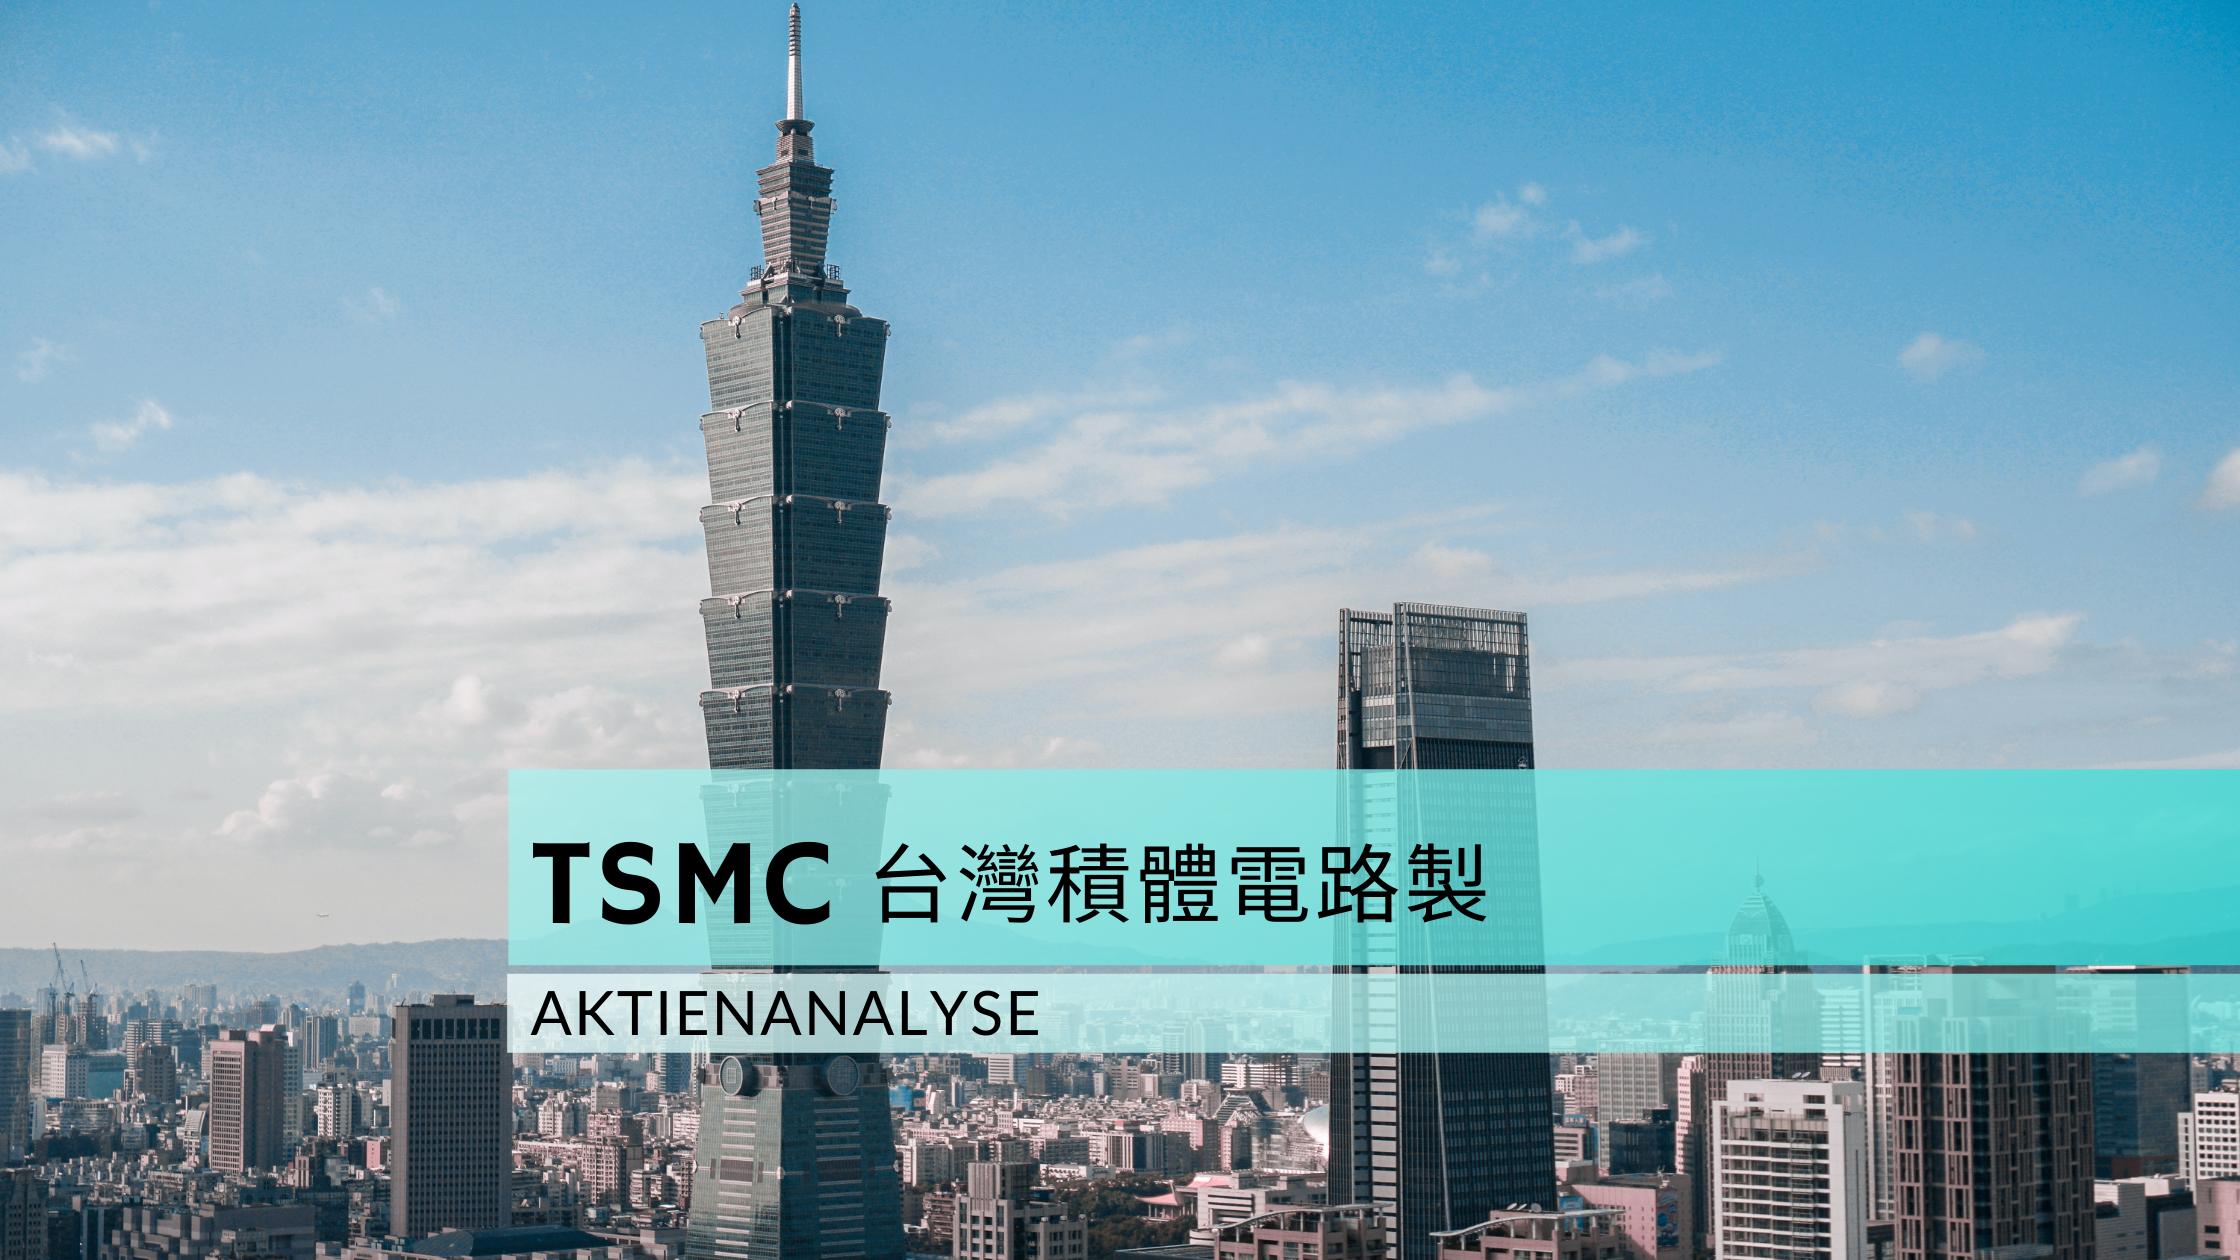 TSMC Aktienanalyse